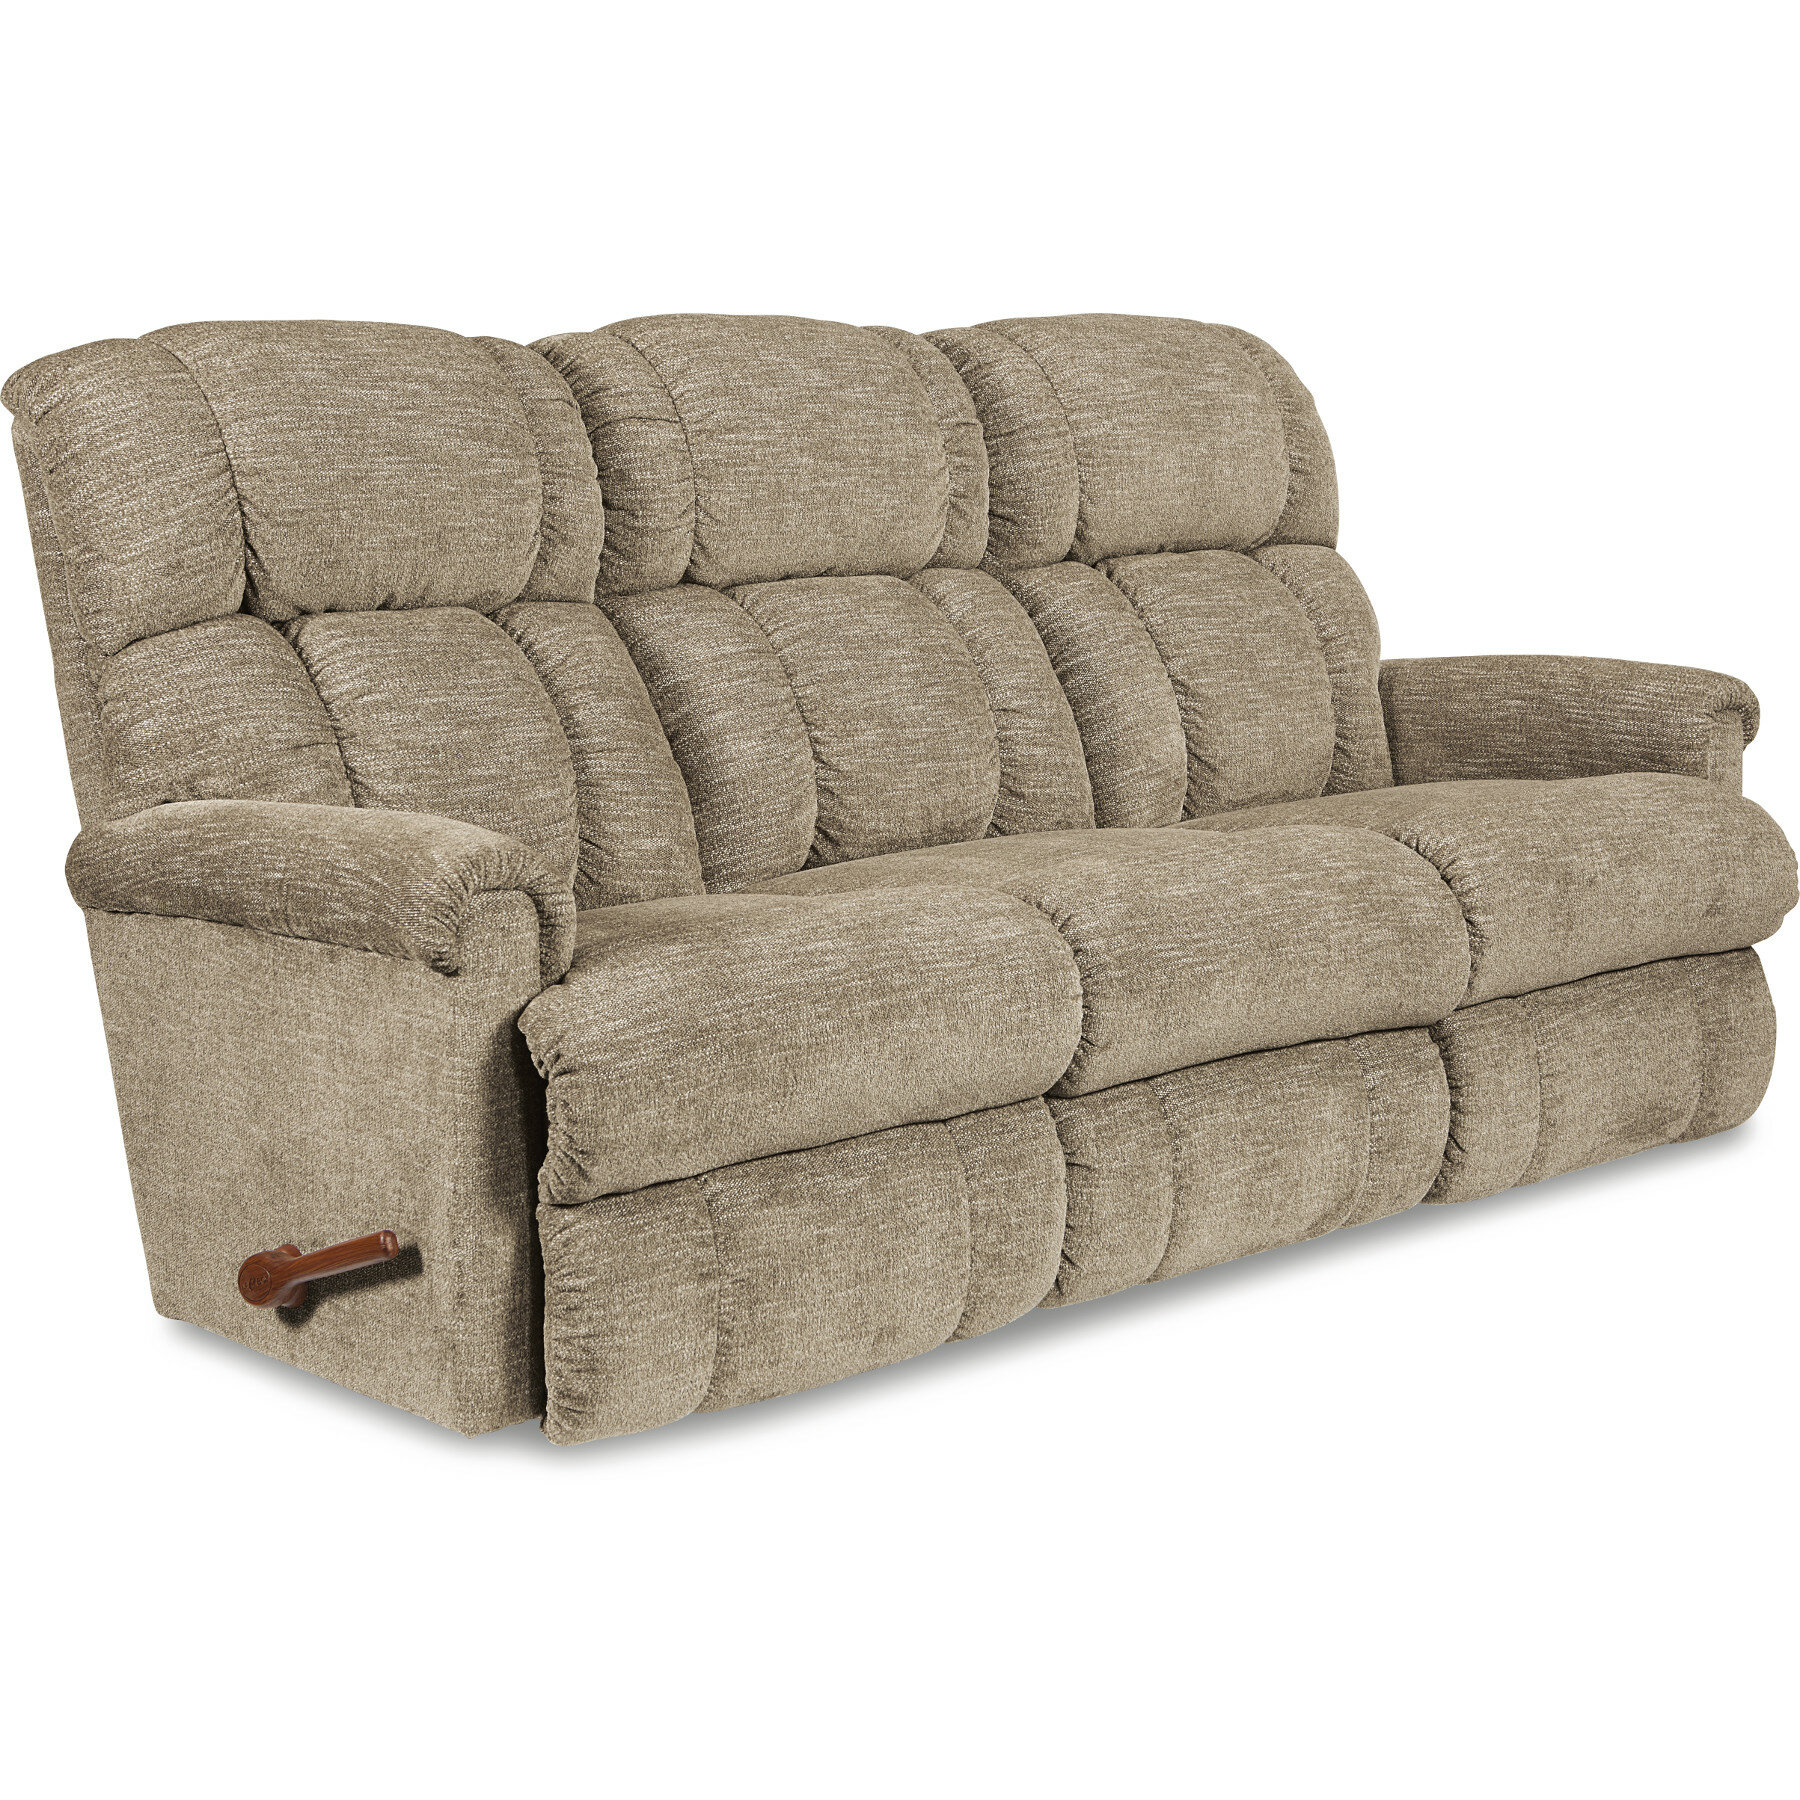 La-Z-Boy Pinnacle Reclining Sofa   Wayfair